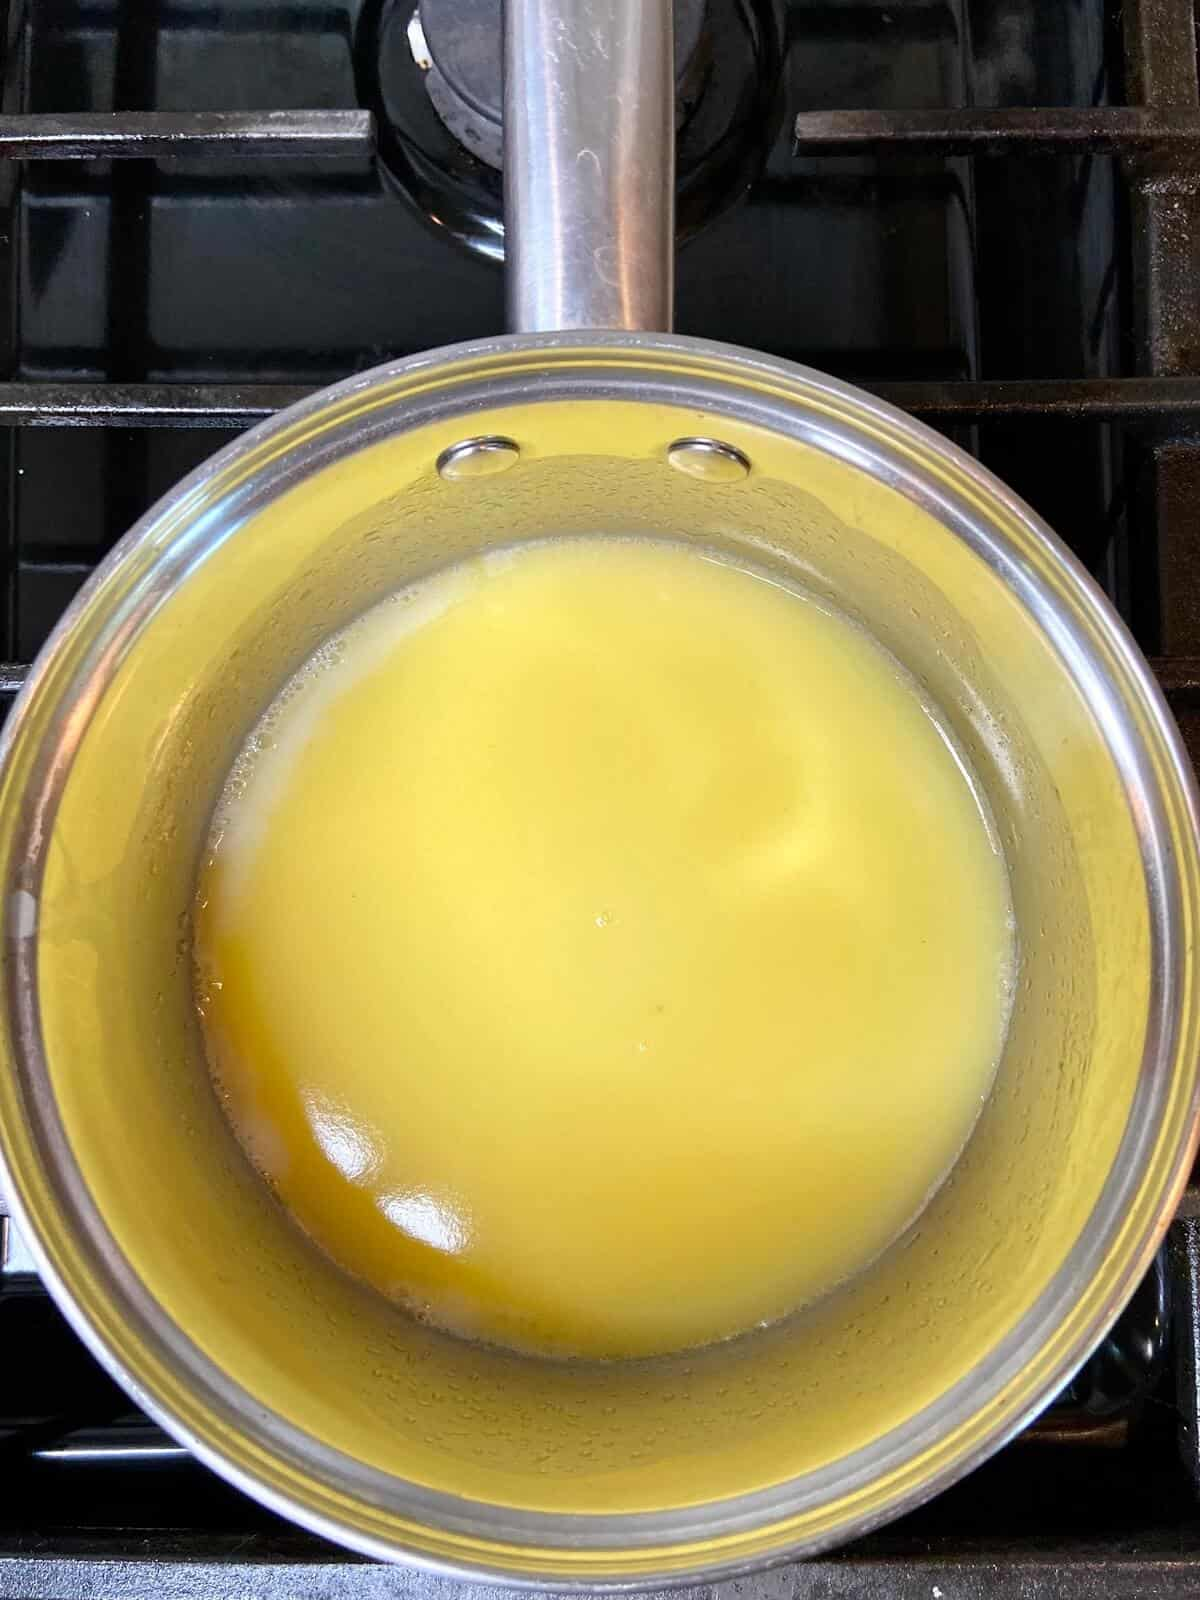 Gougeres Gruyere - Boil milk, water, and salt (Photo by Erich Boenzli)